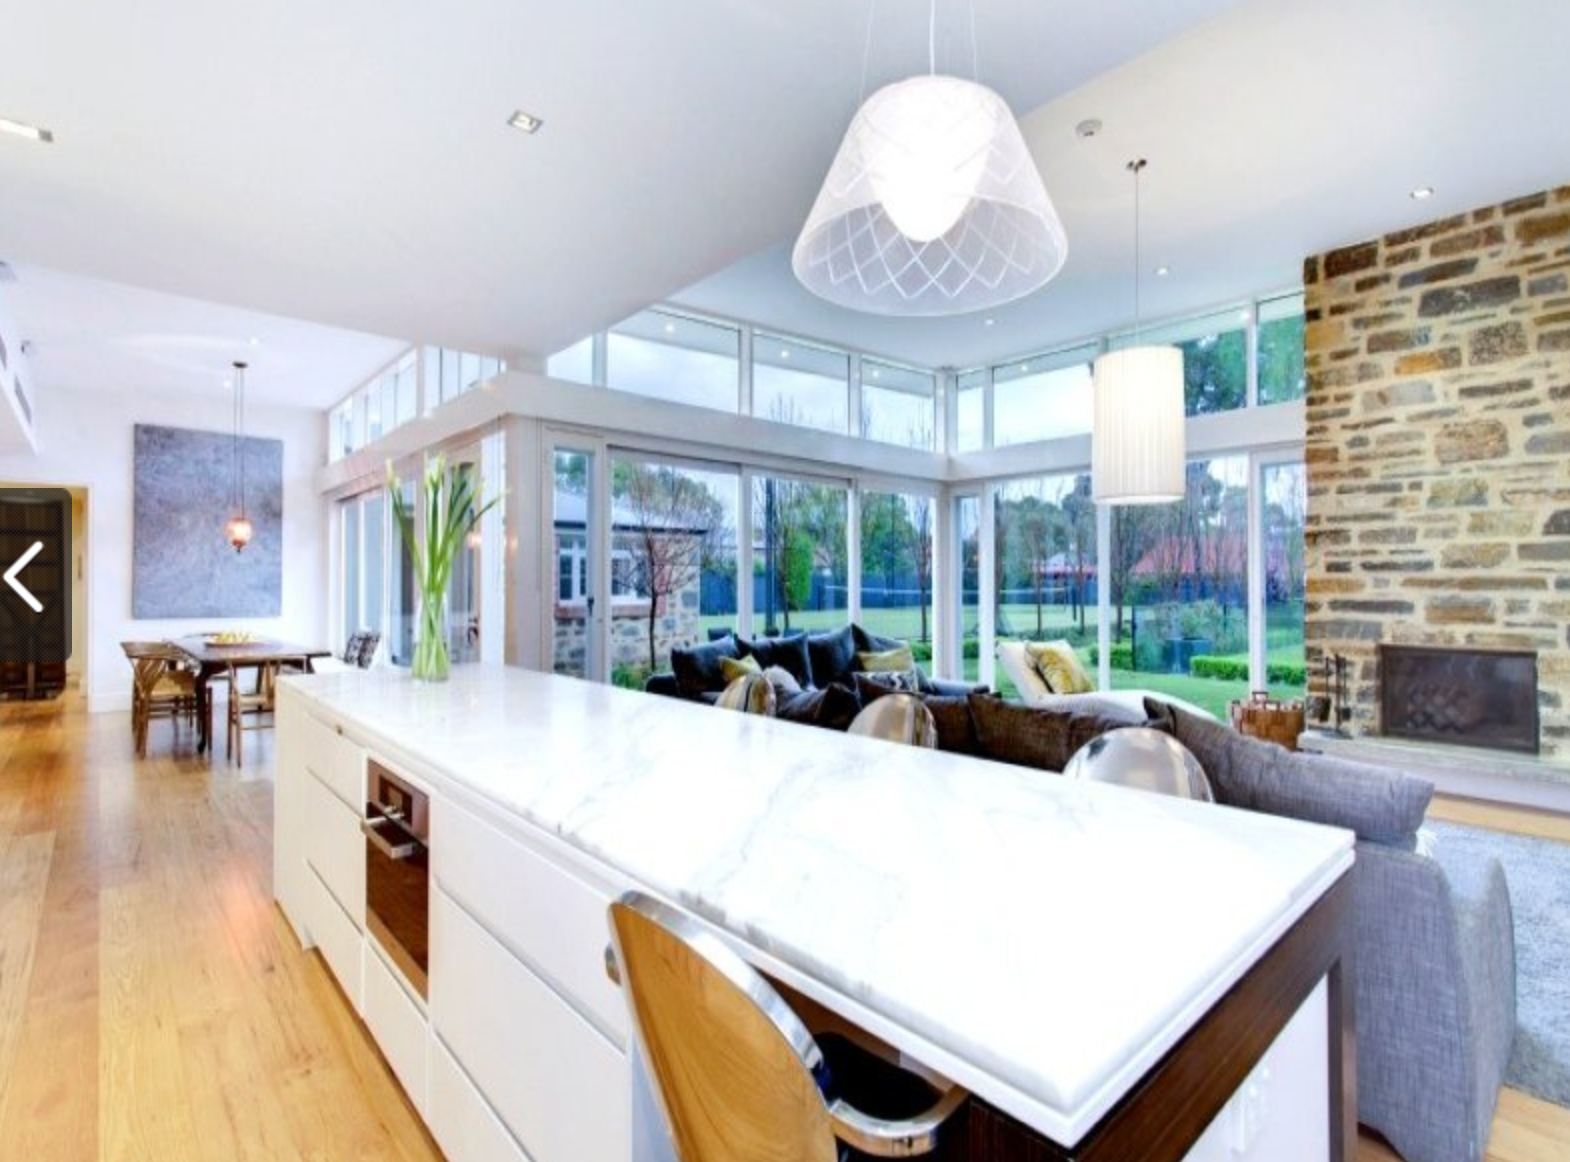 Adelaide Villa: The modern Australian house renovation | interiors ...